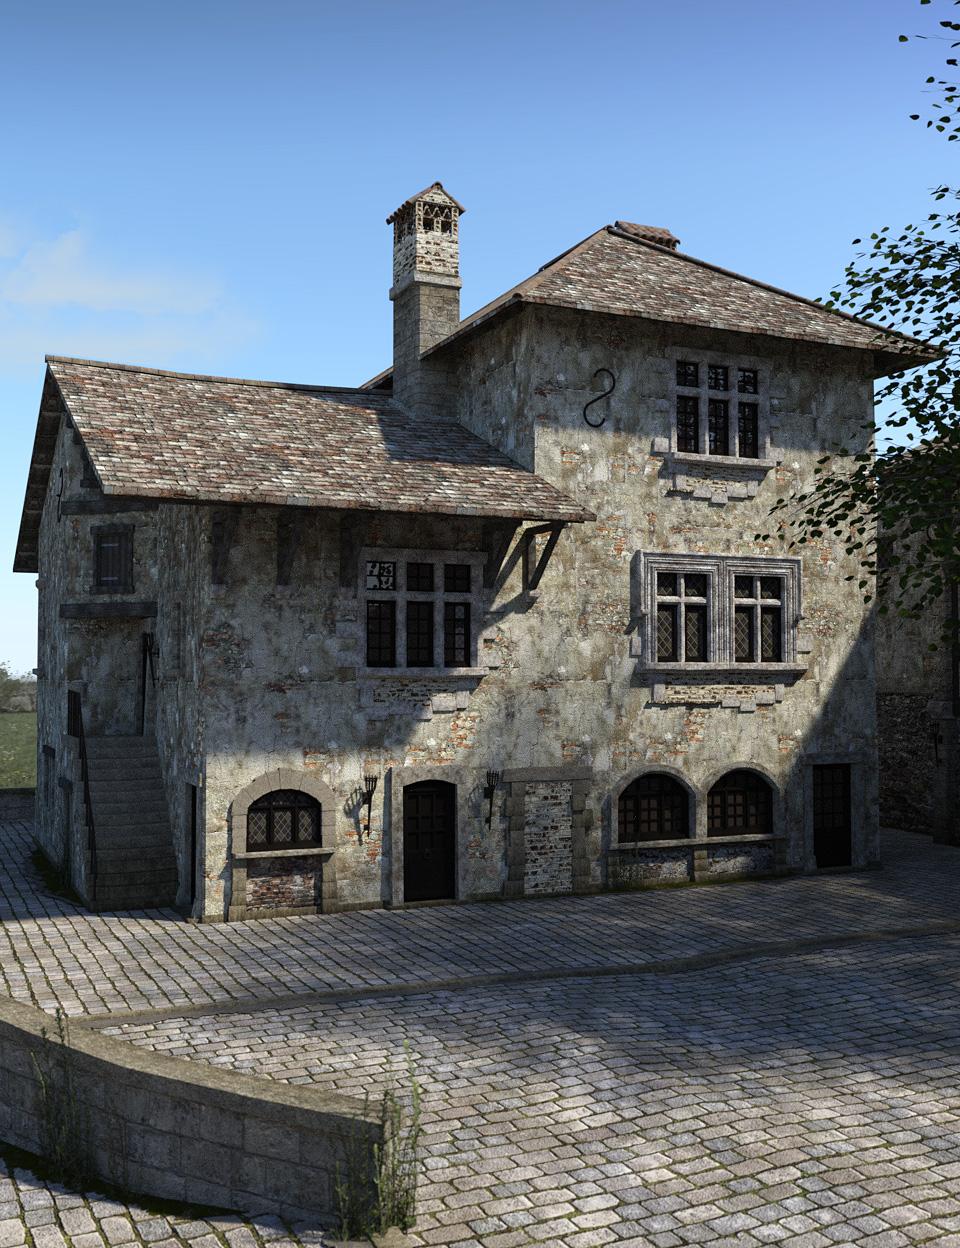 Perouges, Medieval Village by: Faveral, 3D Models by Daz 3D